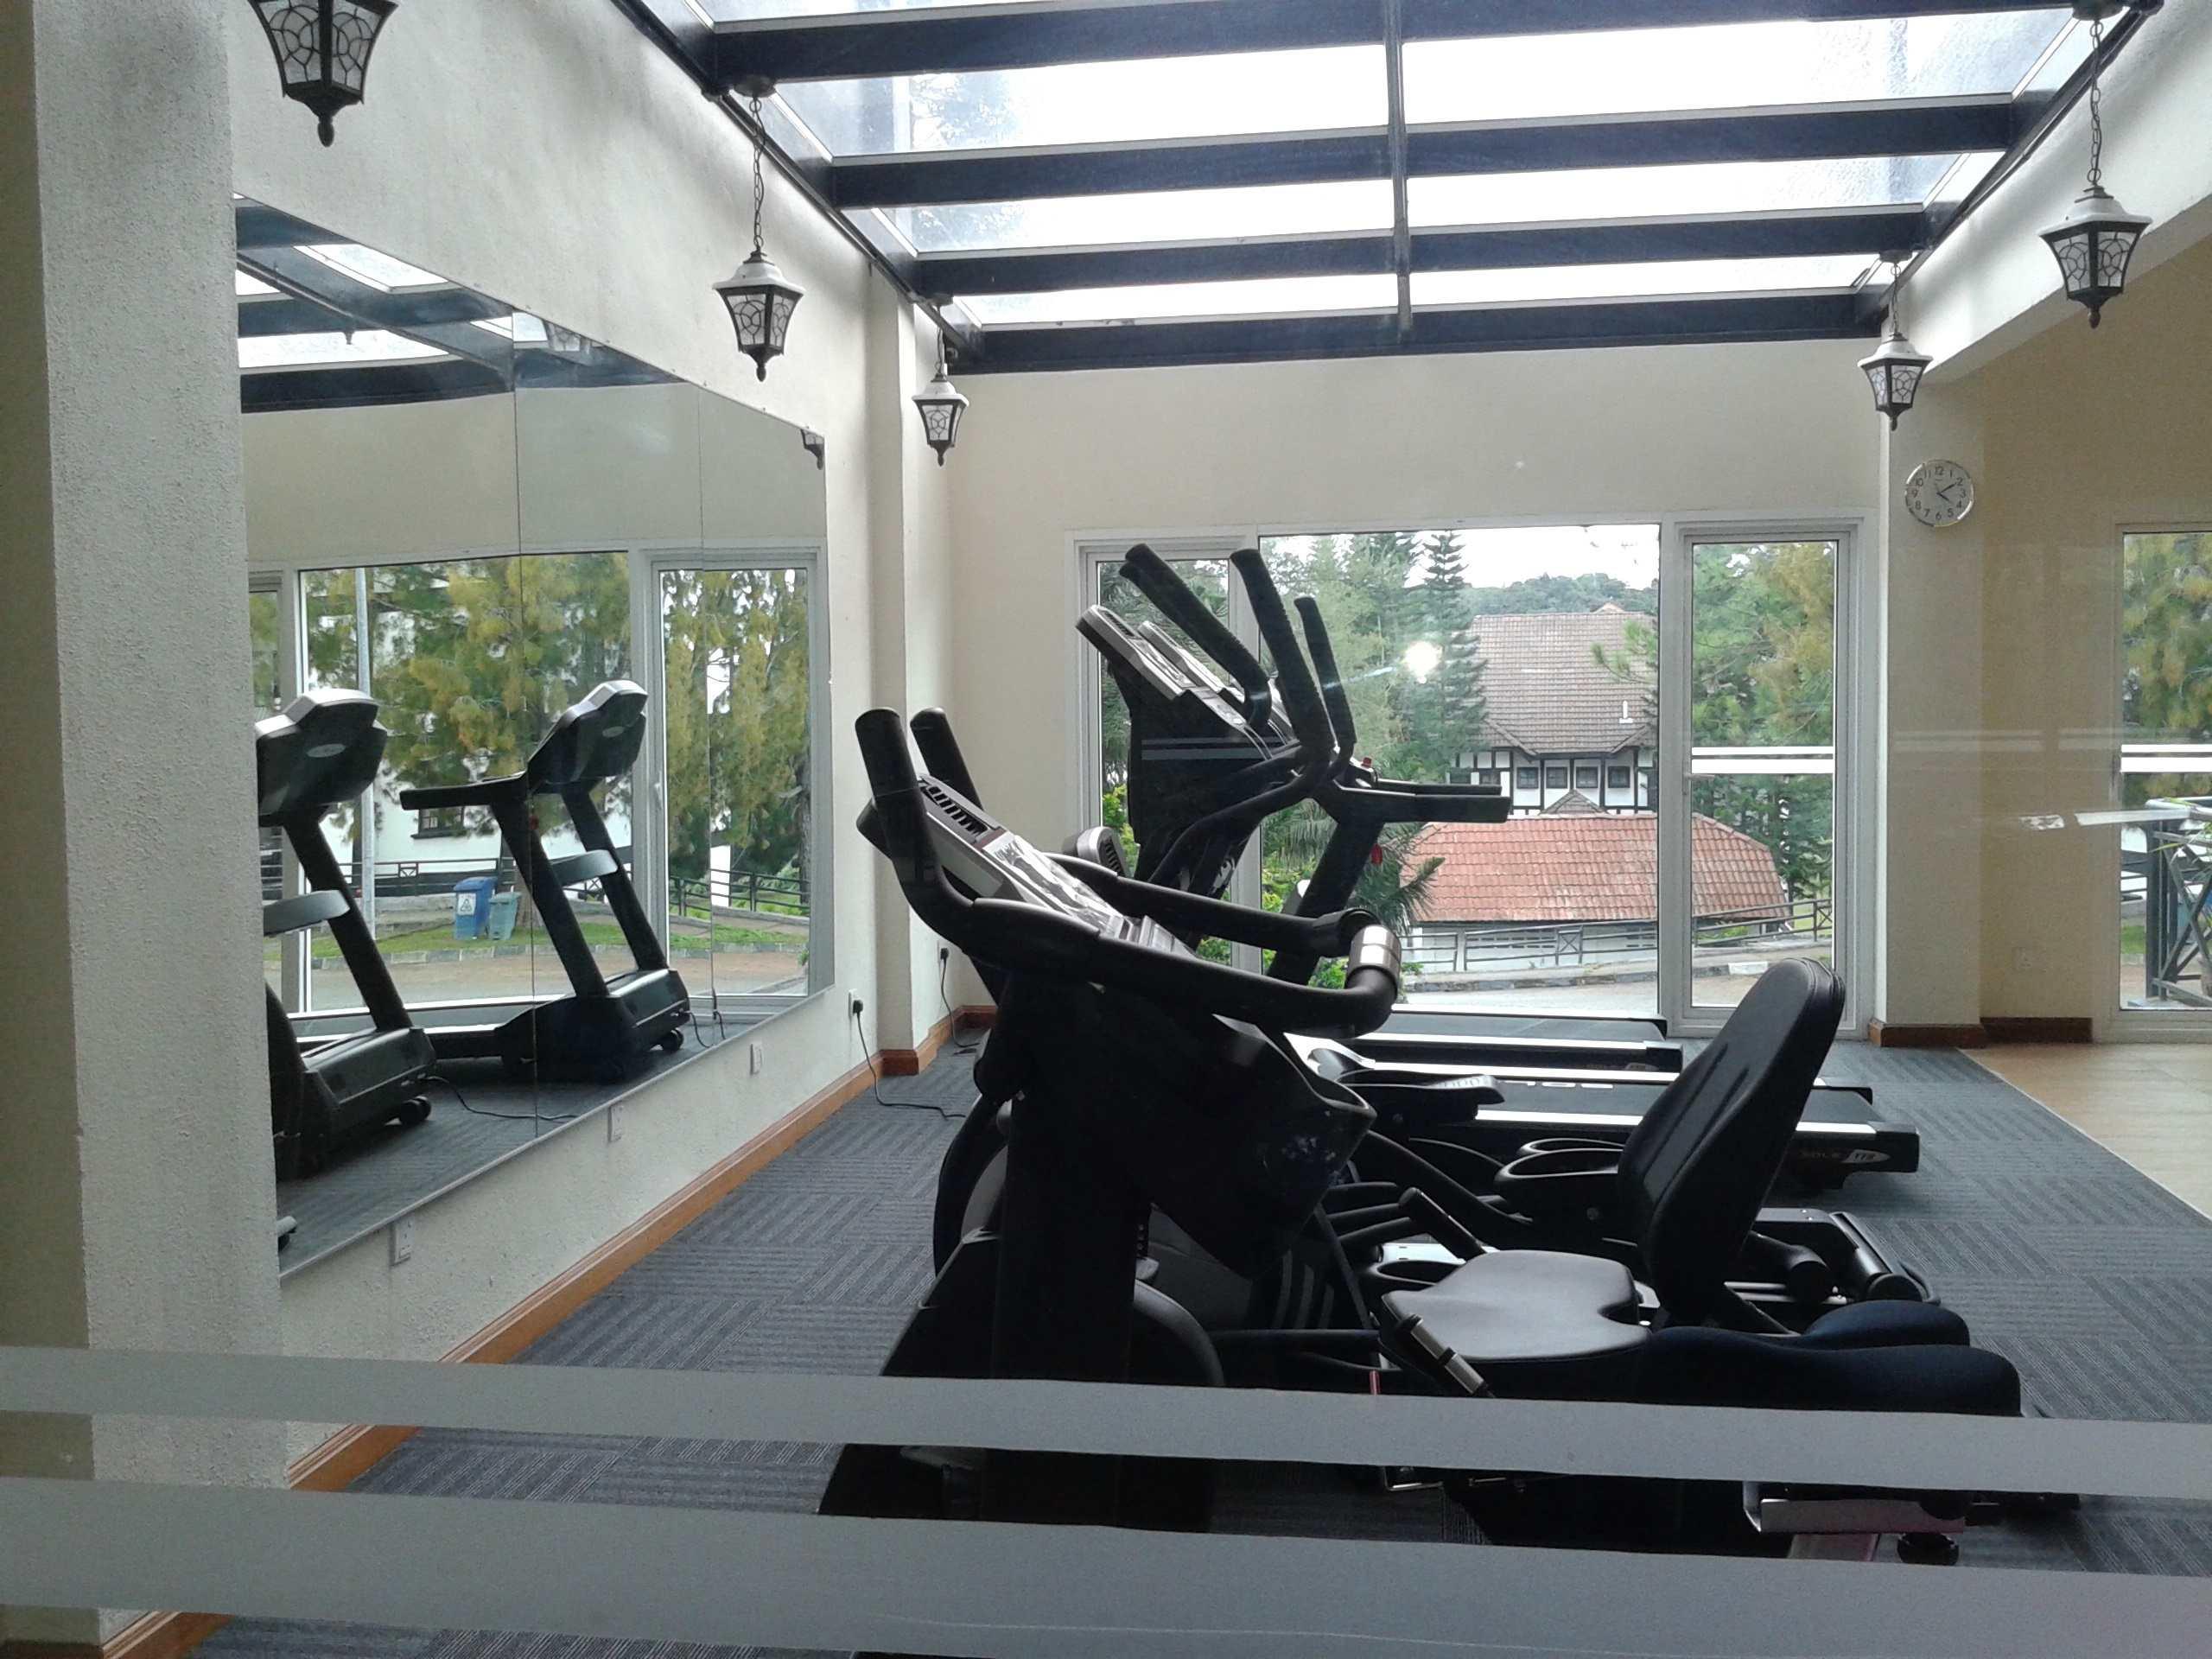 cameron fitness1